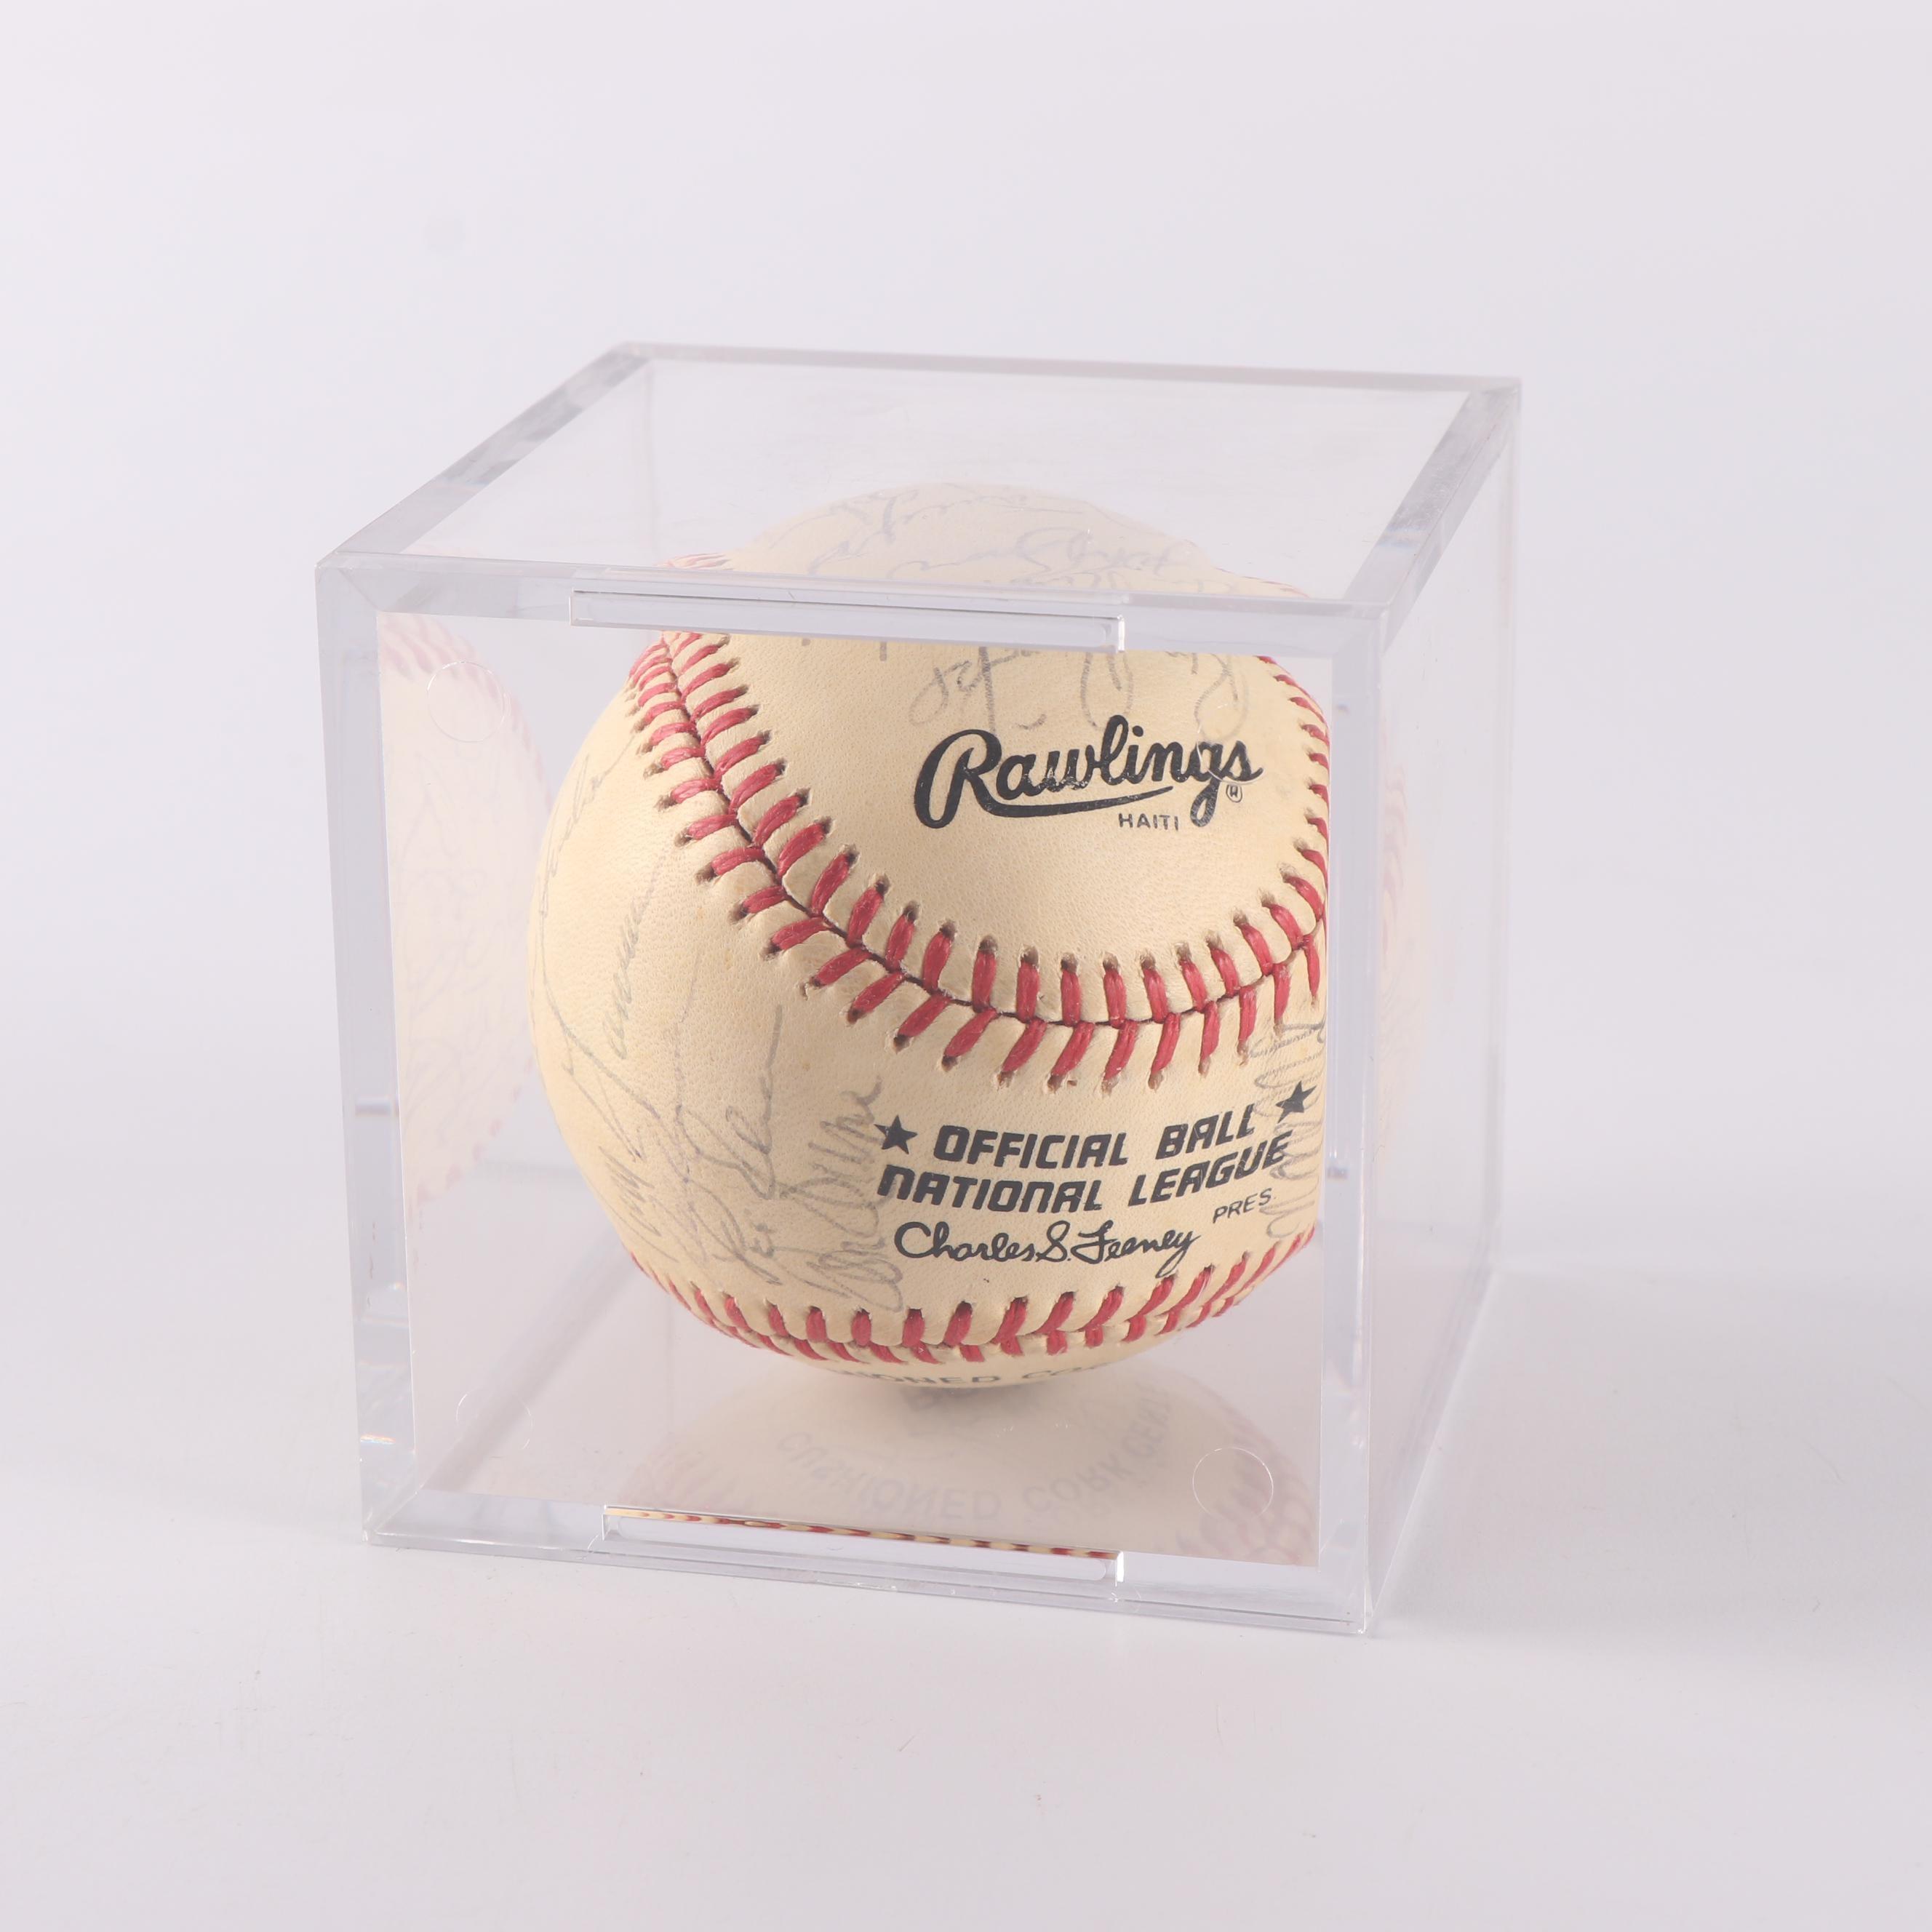 Philadelphia Phillies Autographed Baseball with Claude Osteen